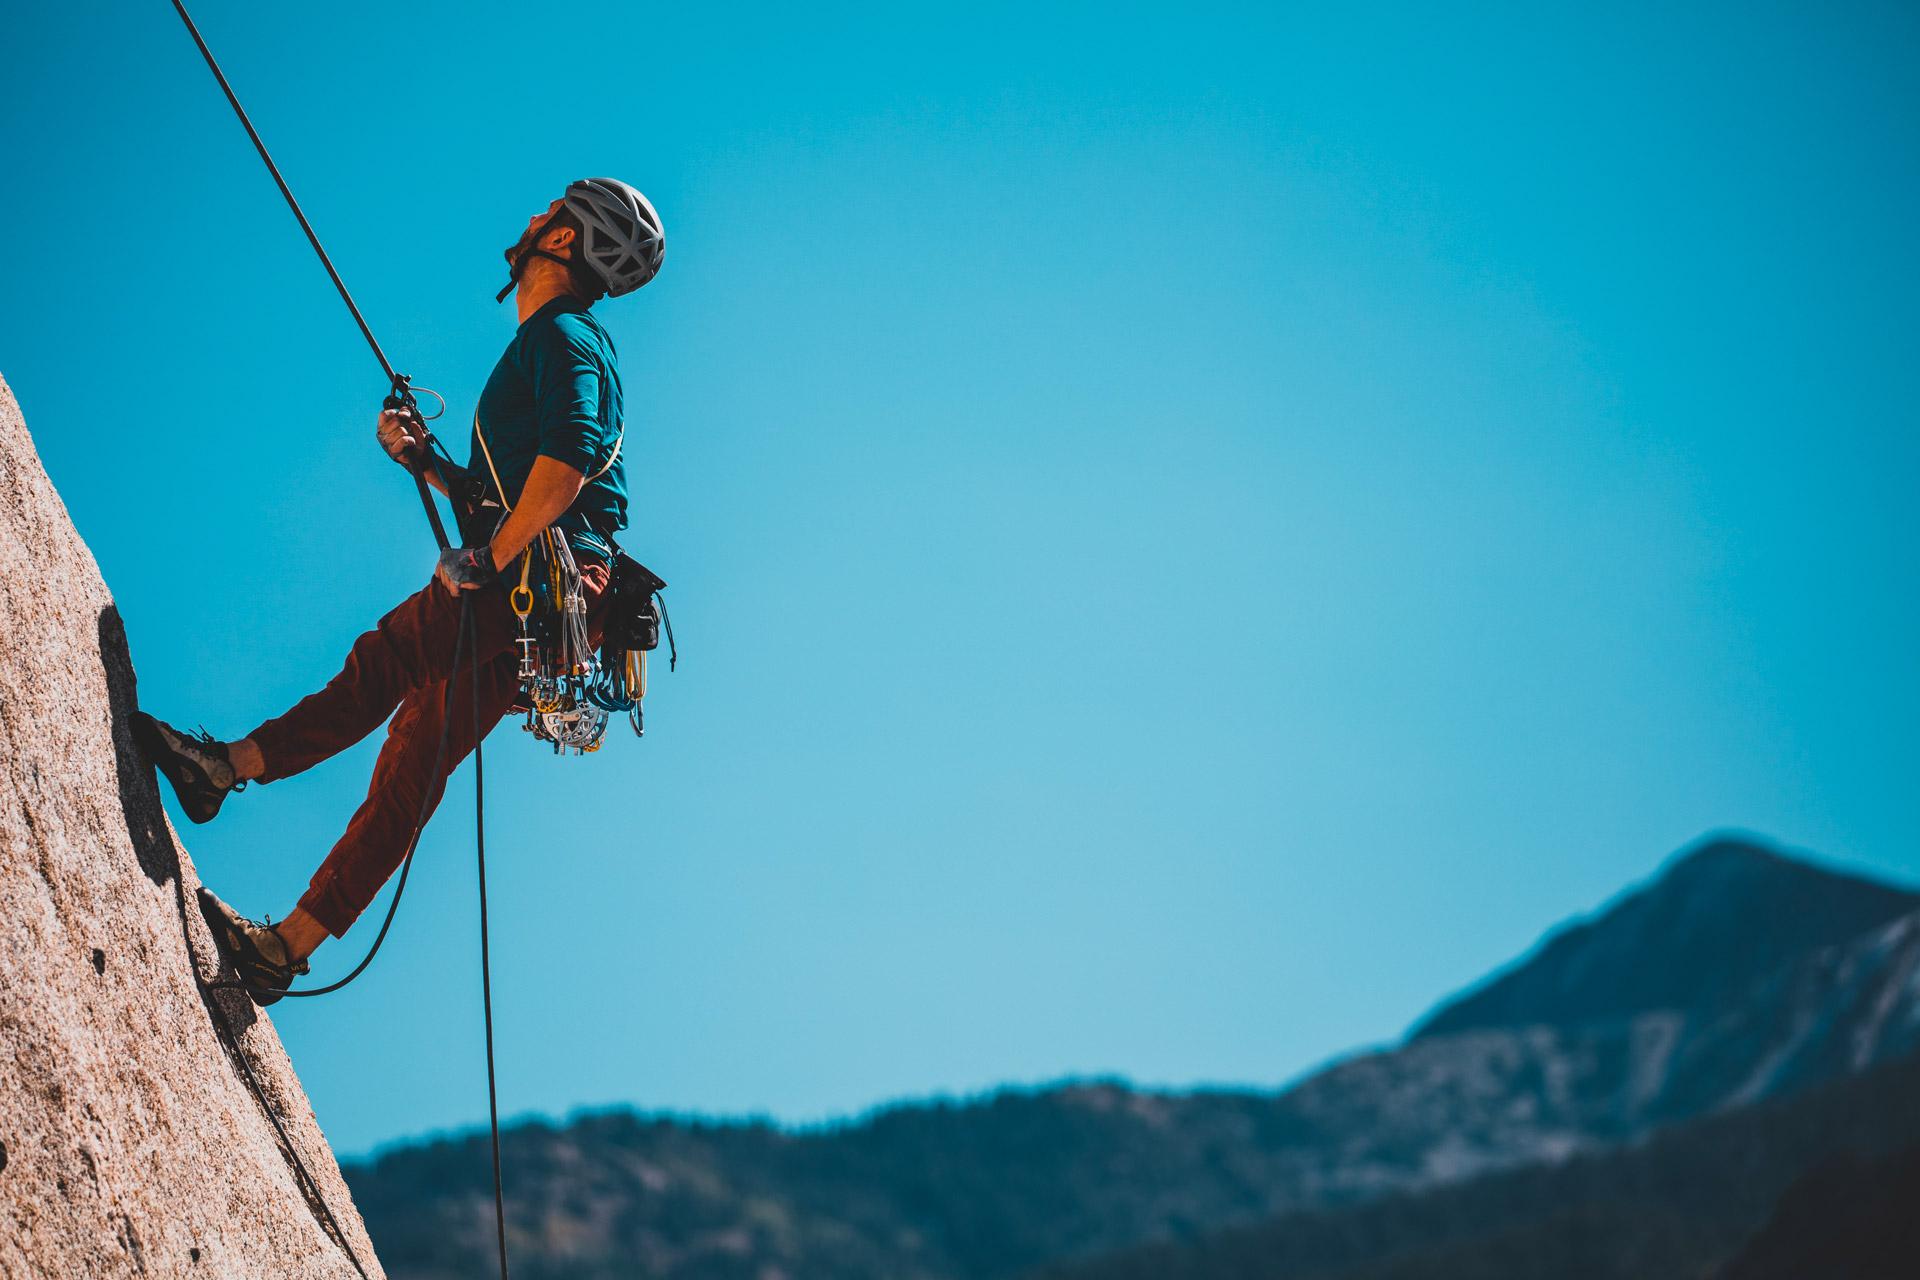 Noir ULILICOO Escalade Corde Sac De Rangement D/épaule Escalade Corde Sac Pliable Imperm/éable Sac D/épaule dalpinisme pour Escalade Randonn/ée